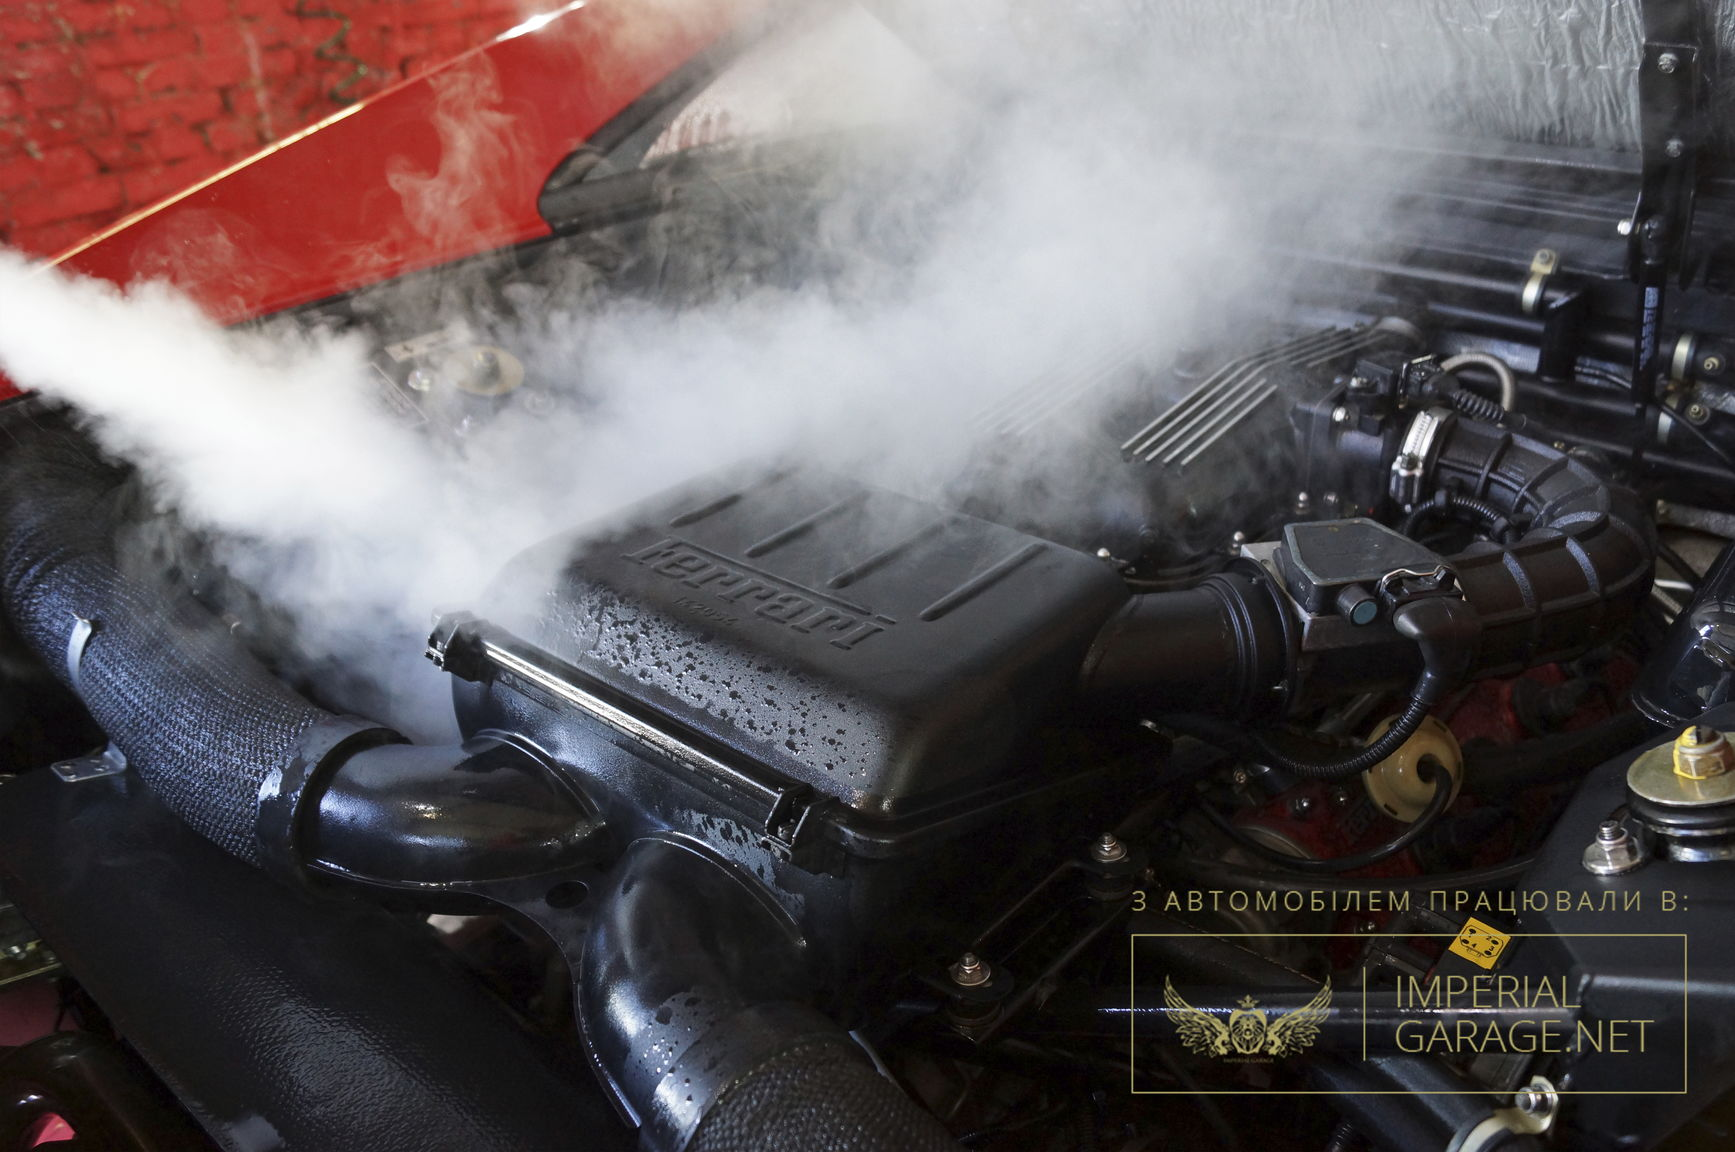 Безпечна мийка двигуна парою